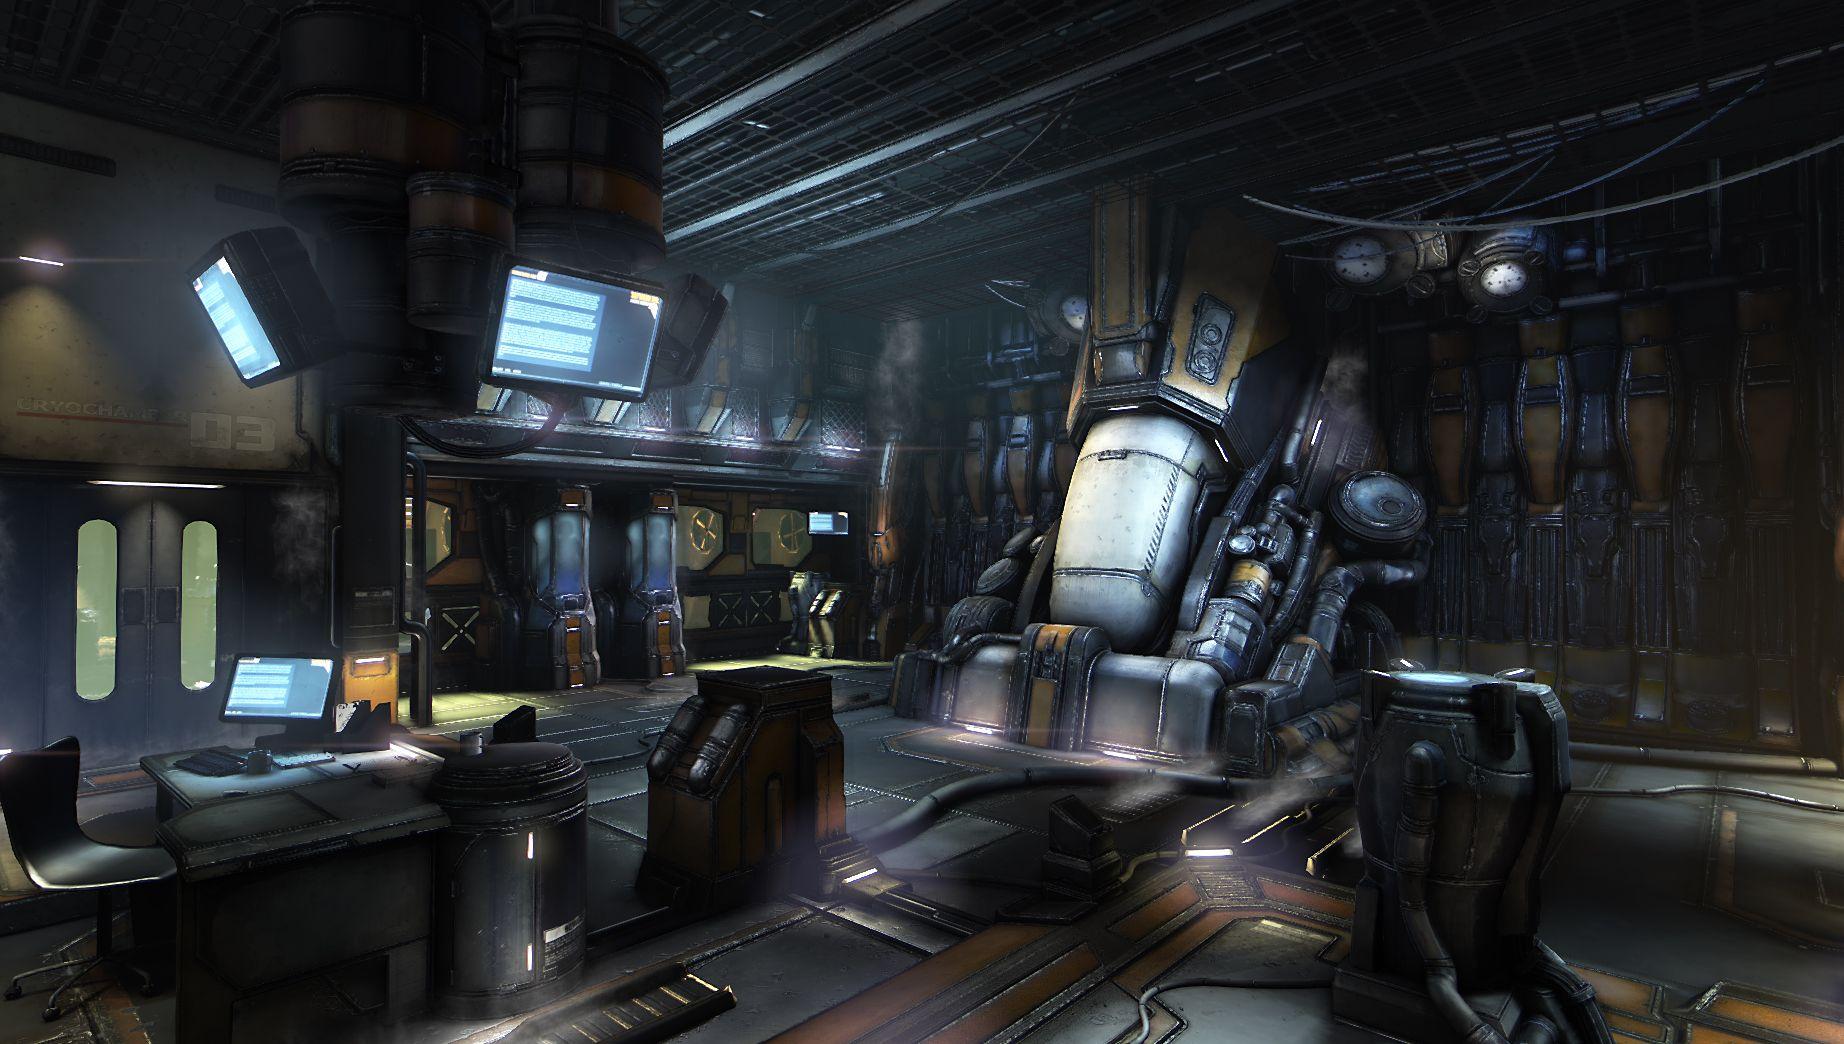 Future futuristic cyberpunk atmosphere science fiction for Cyberpunk interior design